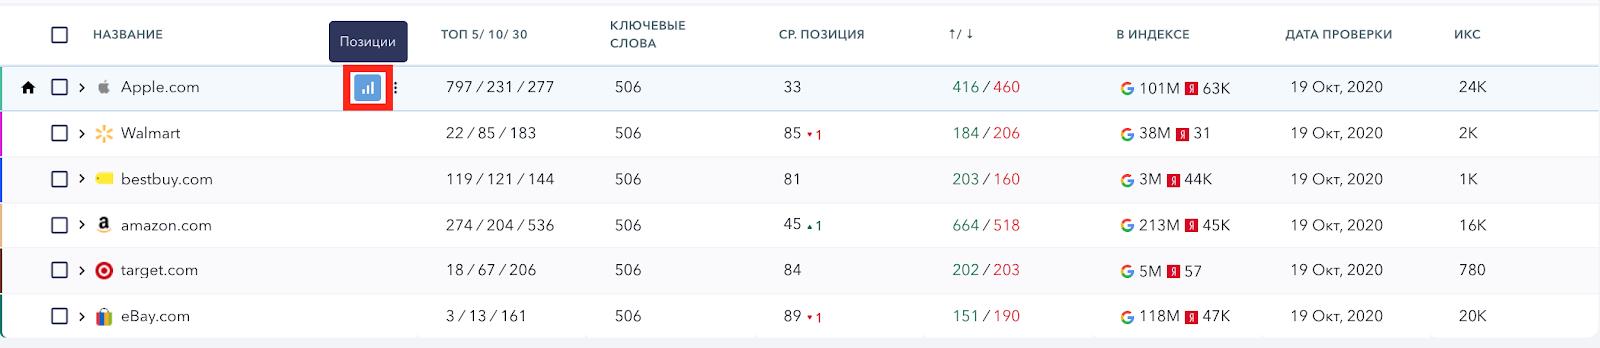 competitors-rankings